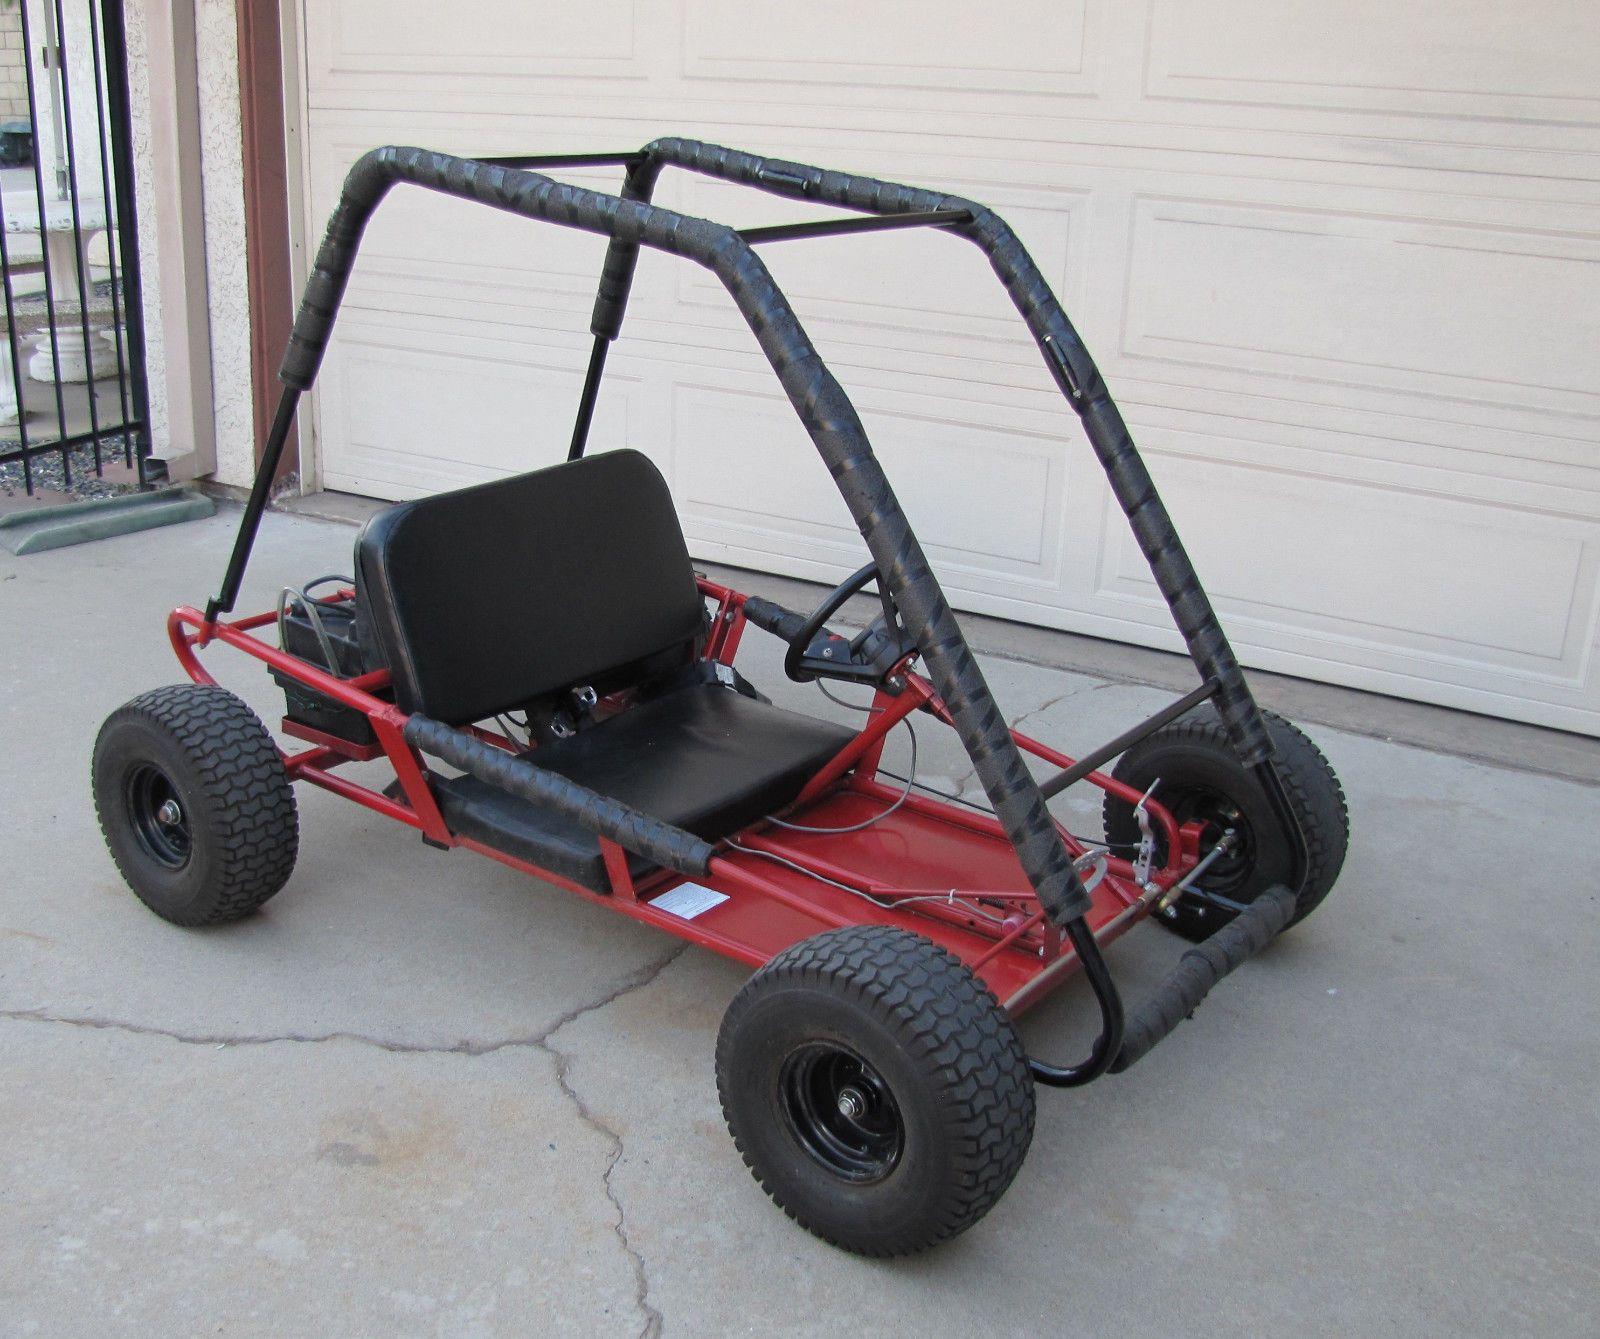 Working Kango Electric Go Kart Go Cart | eBay | buggy\'S | Pinterest ...